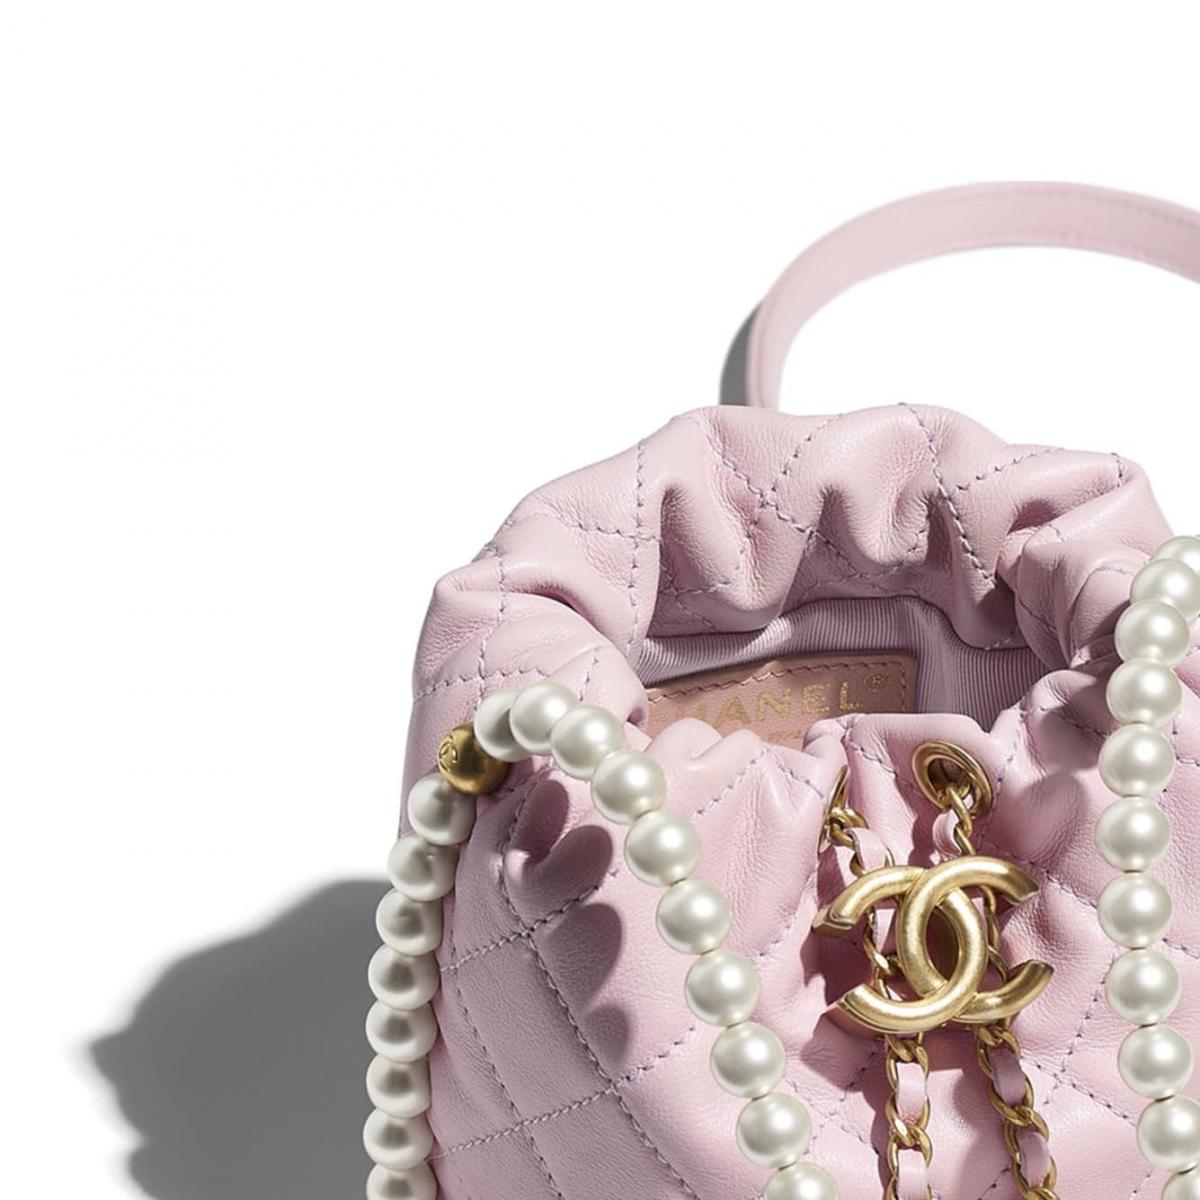 Chanel水桶包也要有「珍珠」!稜格紋、雙C Logo、粉色 ,2021女孩最想要的包就是它!-2